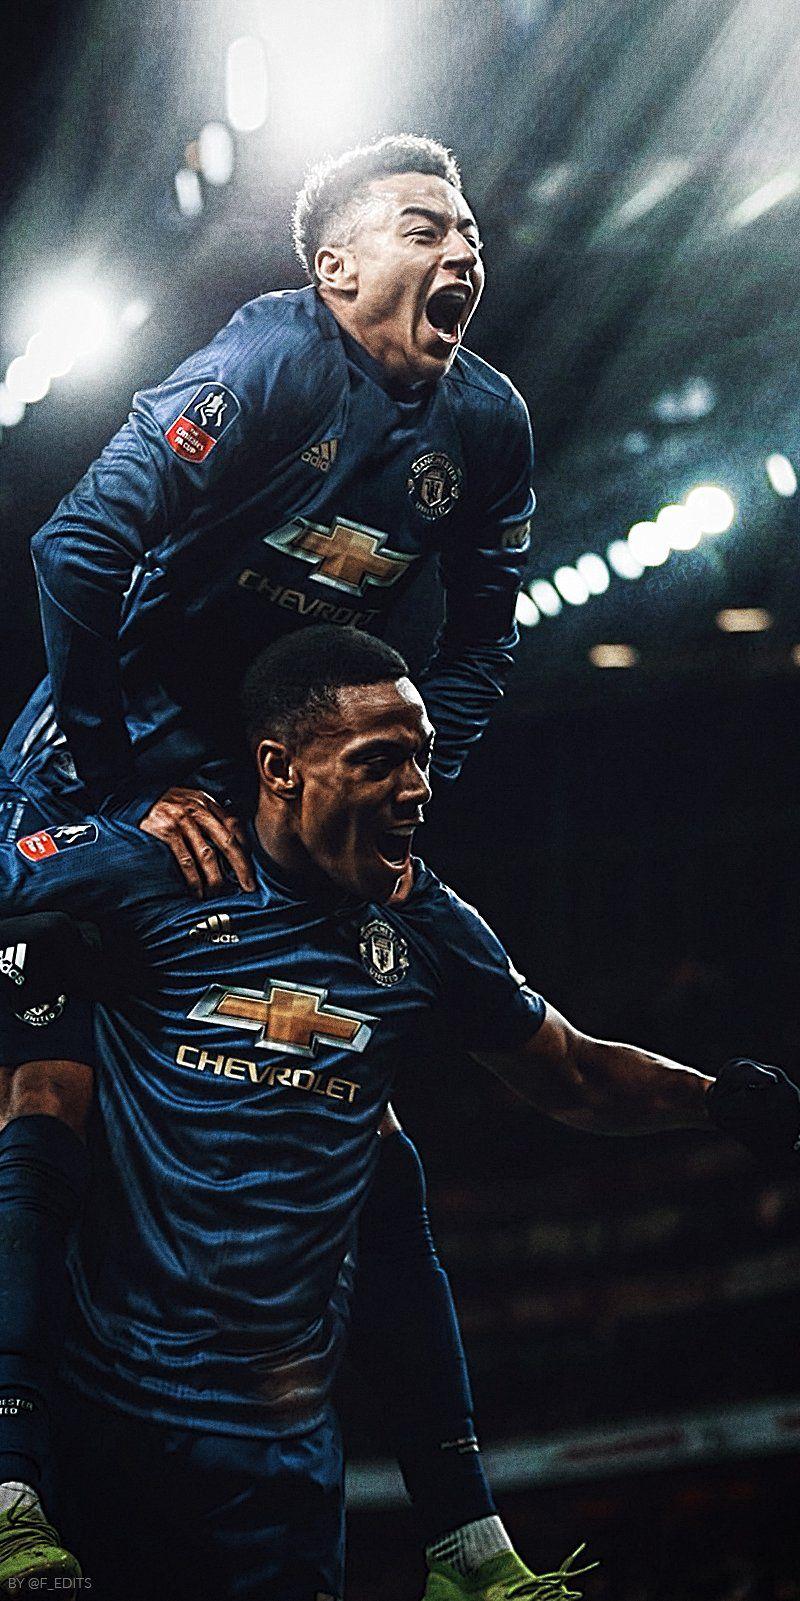 Pin Oleh Christel B Di Manchester United Dasi Pria Pria